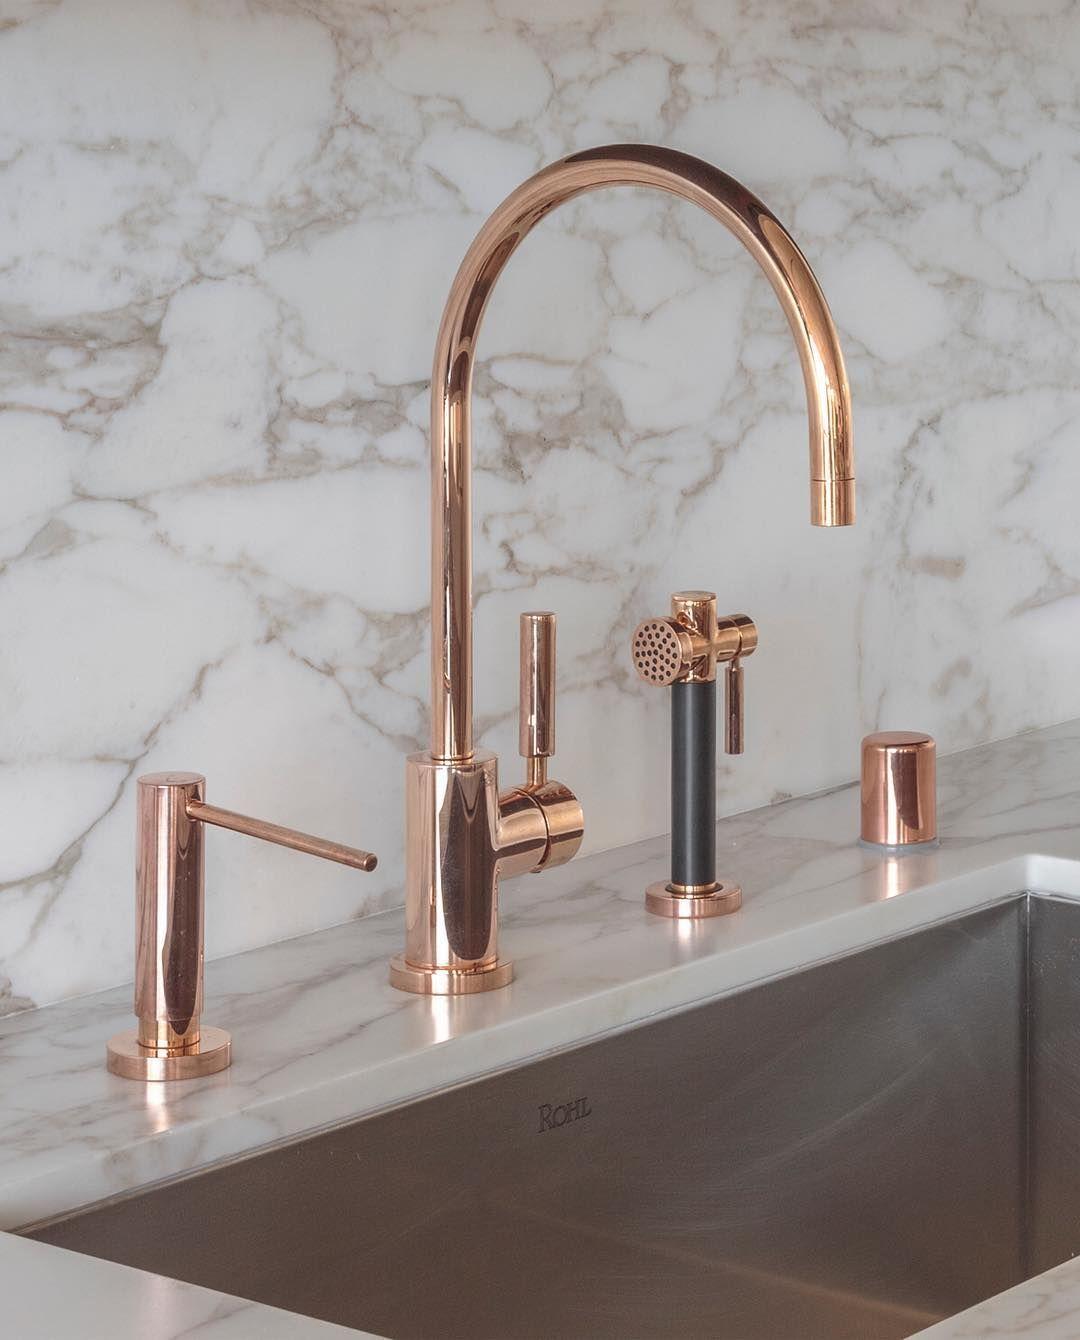 kitchen faucets, Kitchen sink faucets